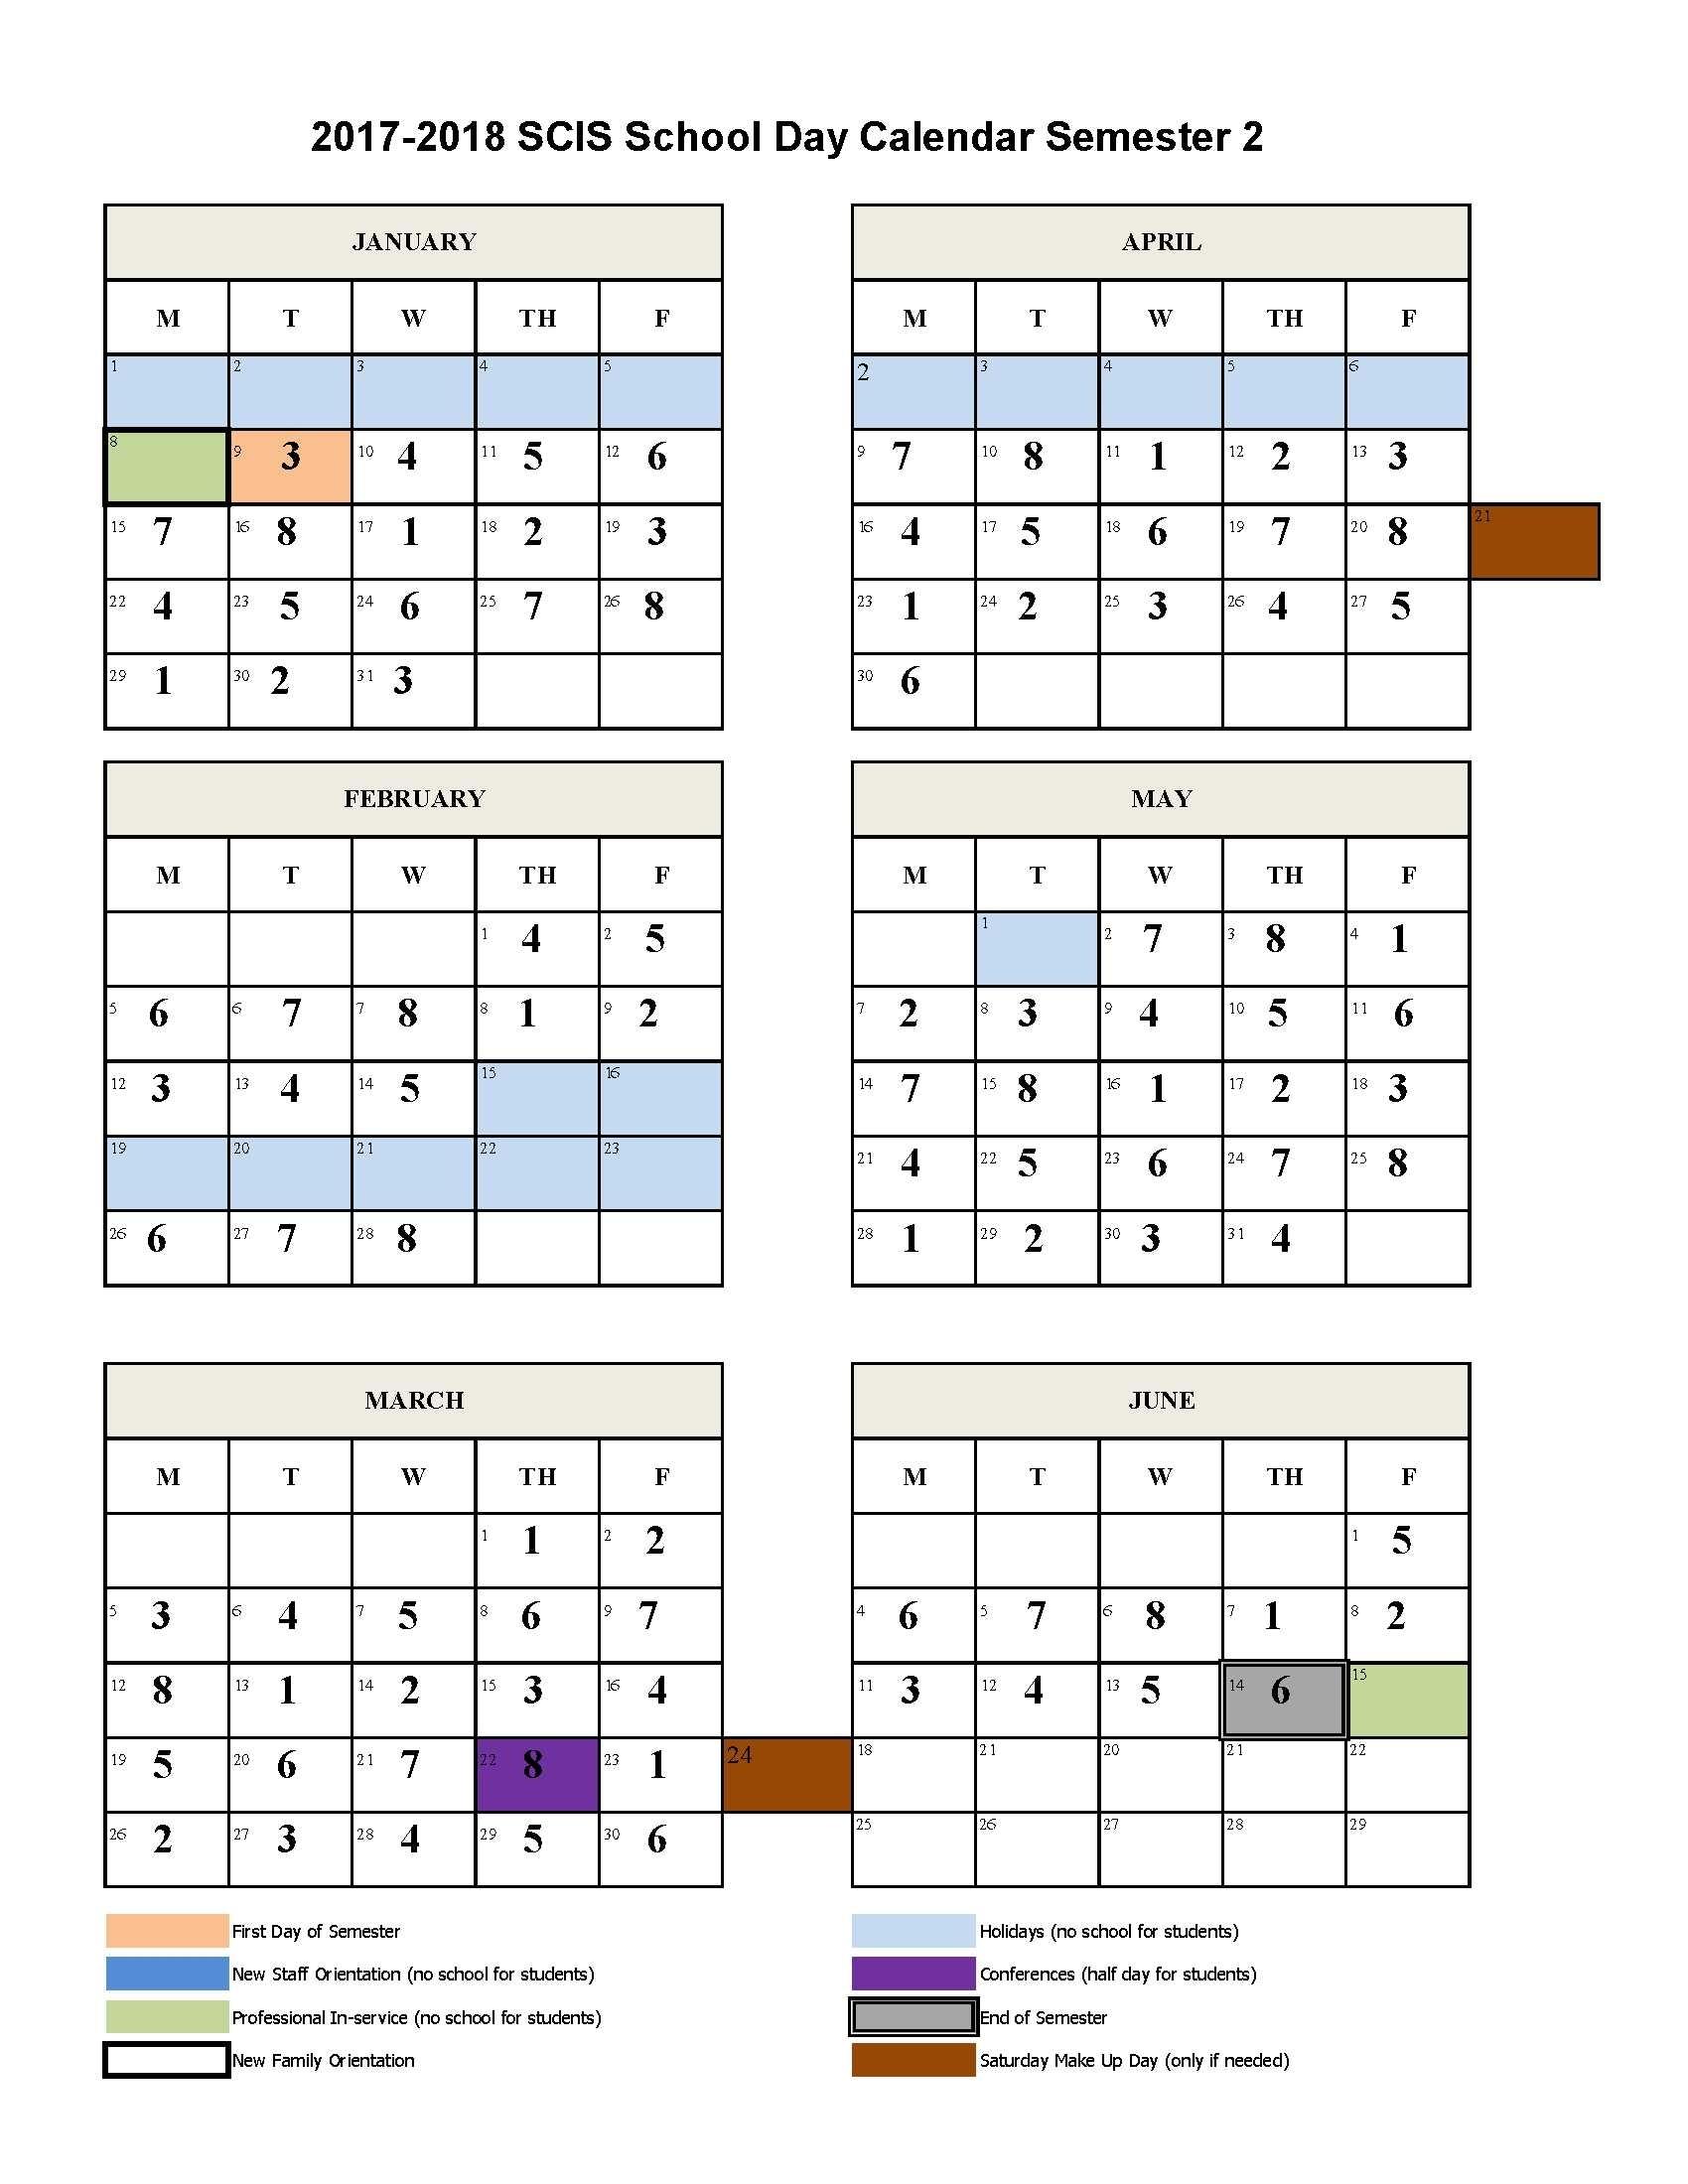 8 Day Calendar(Sem 2) 2017-2018 | Scis - Hongqiao Campus